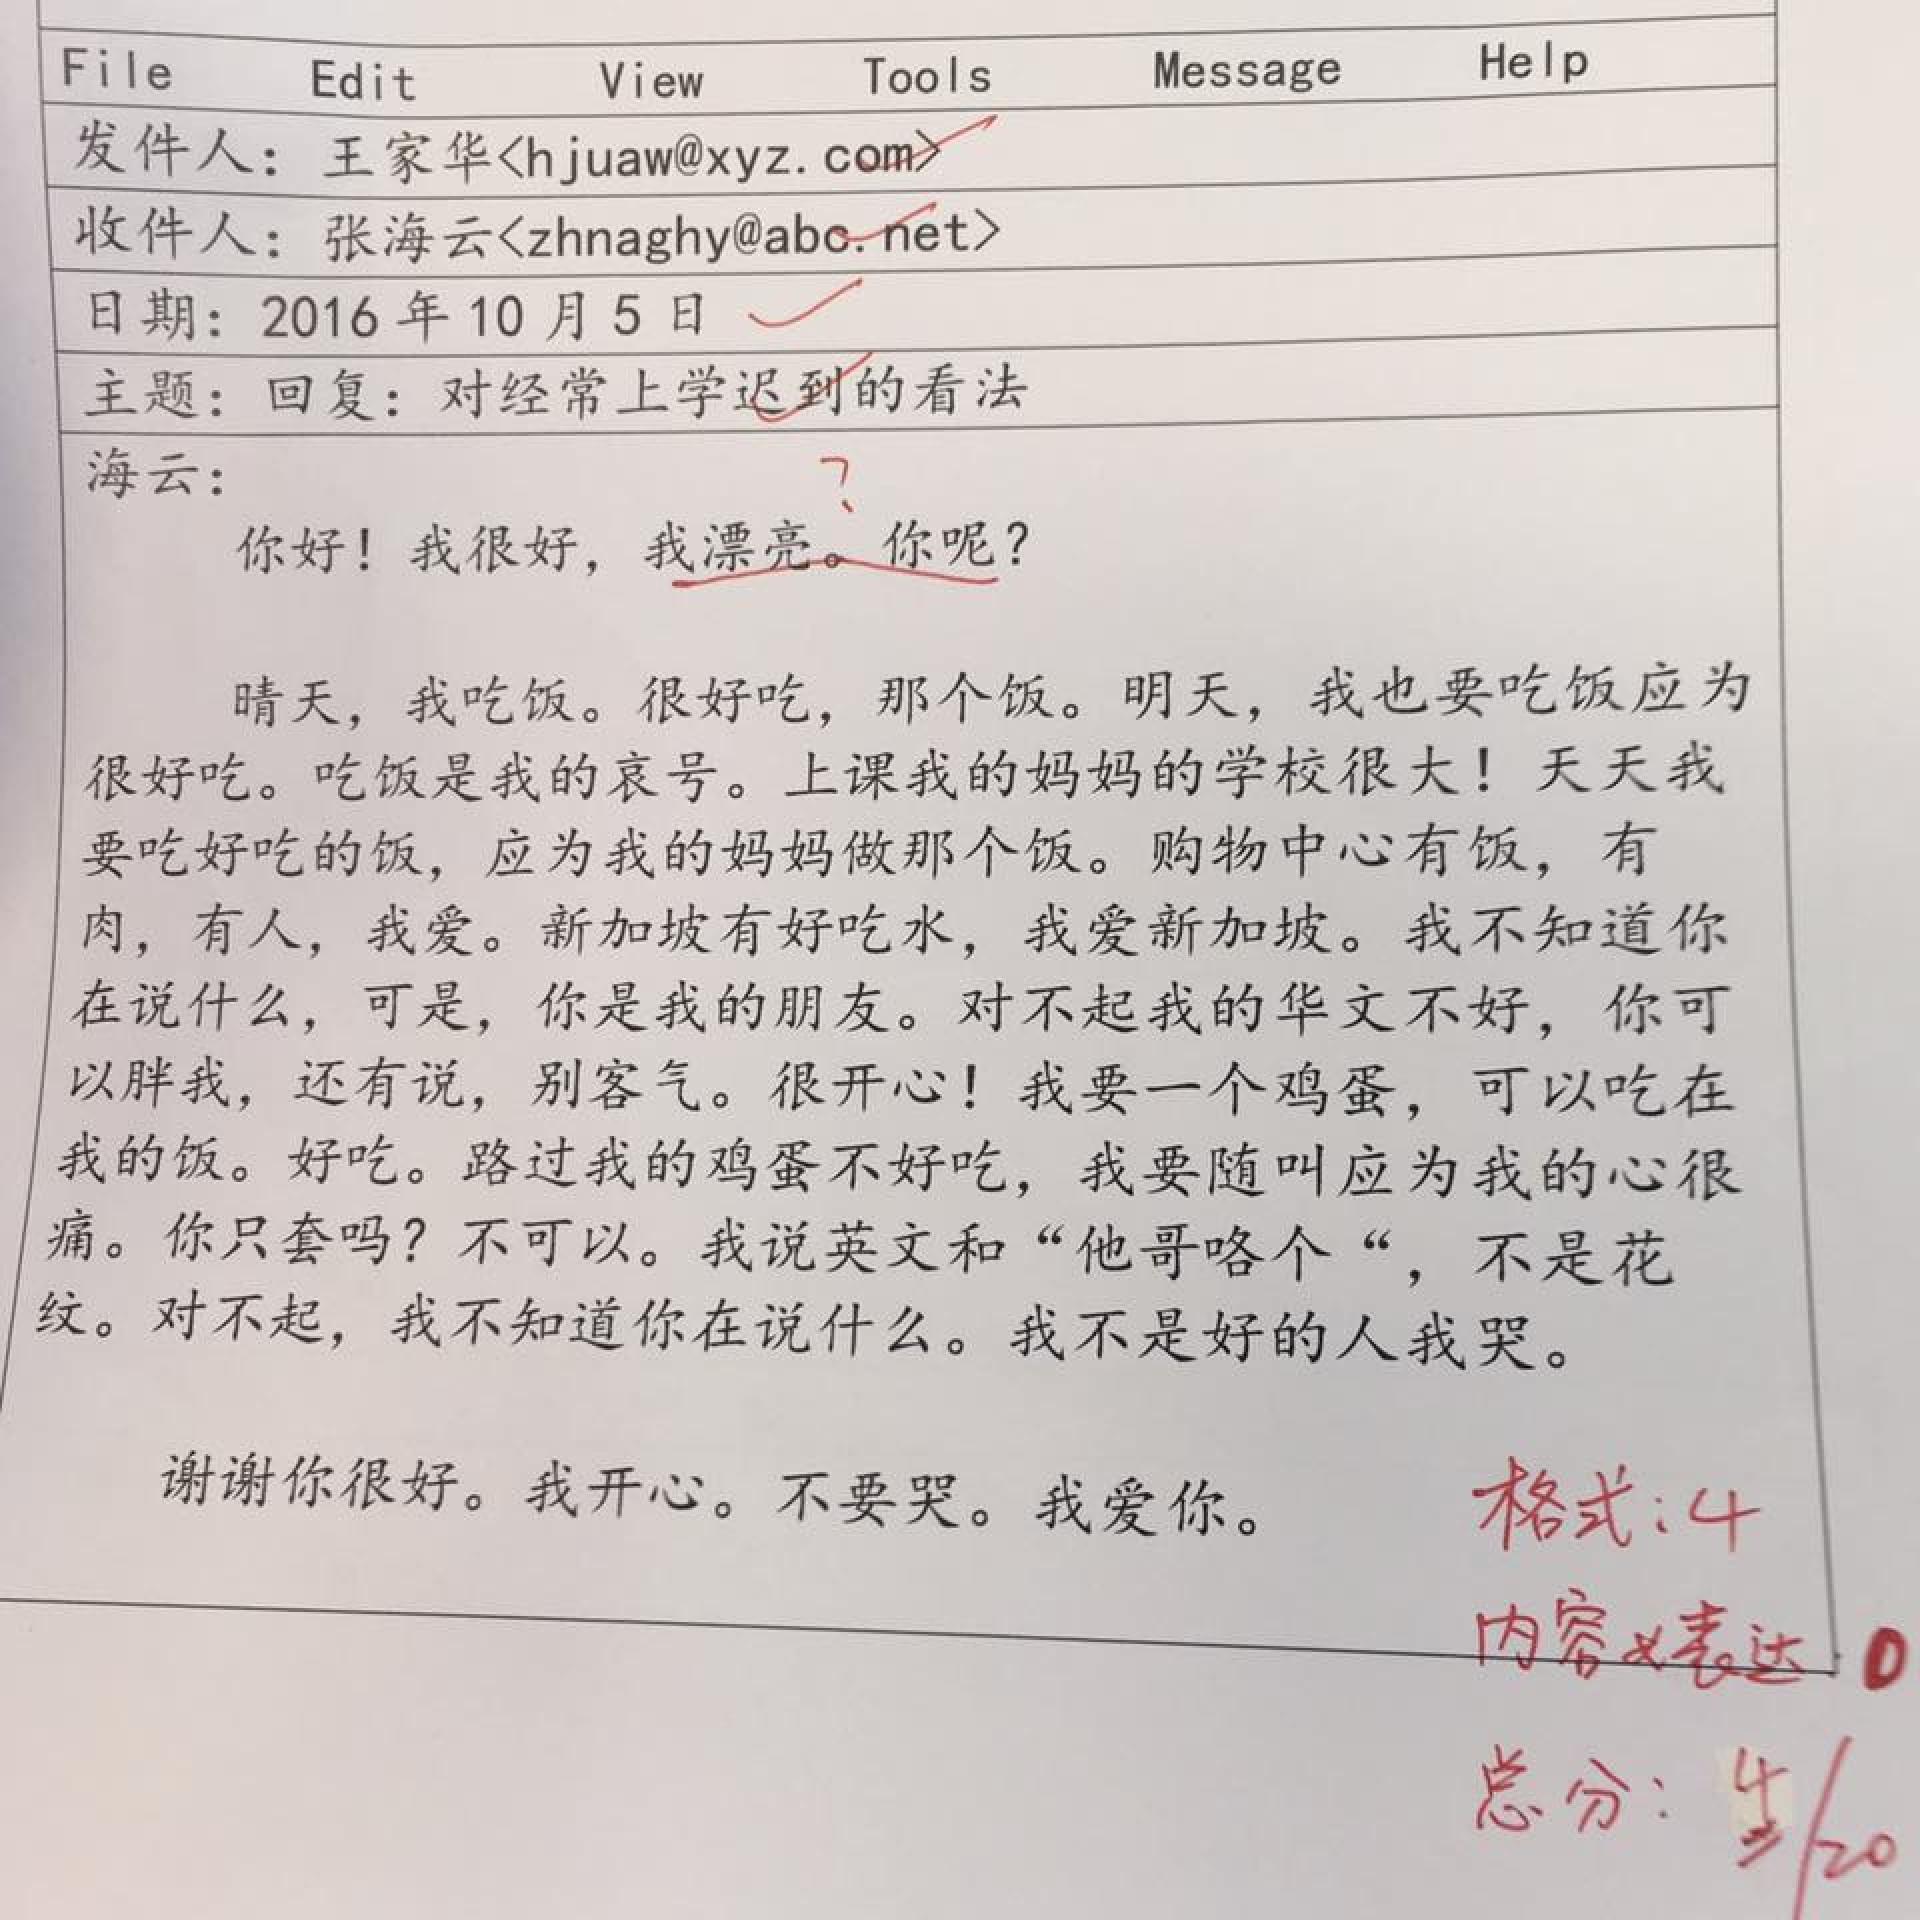 001 Chinese Essay Amazing Language Writing Letter Format Topics 1920